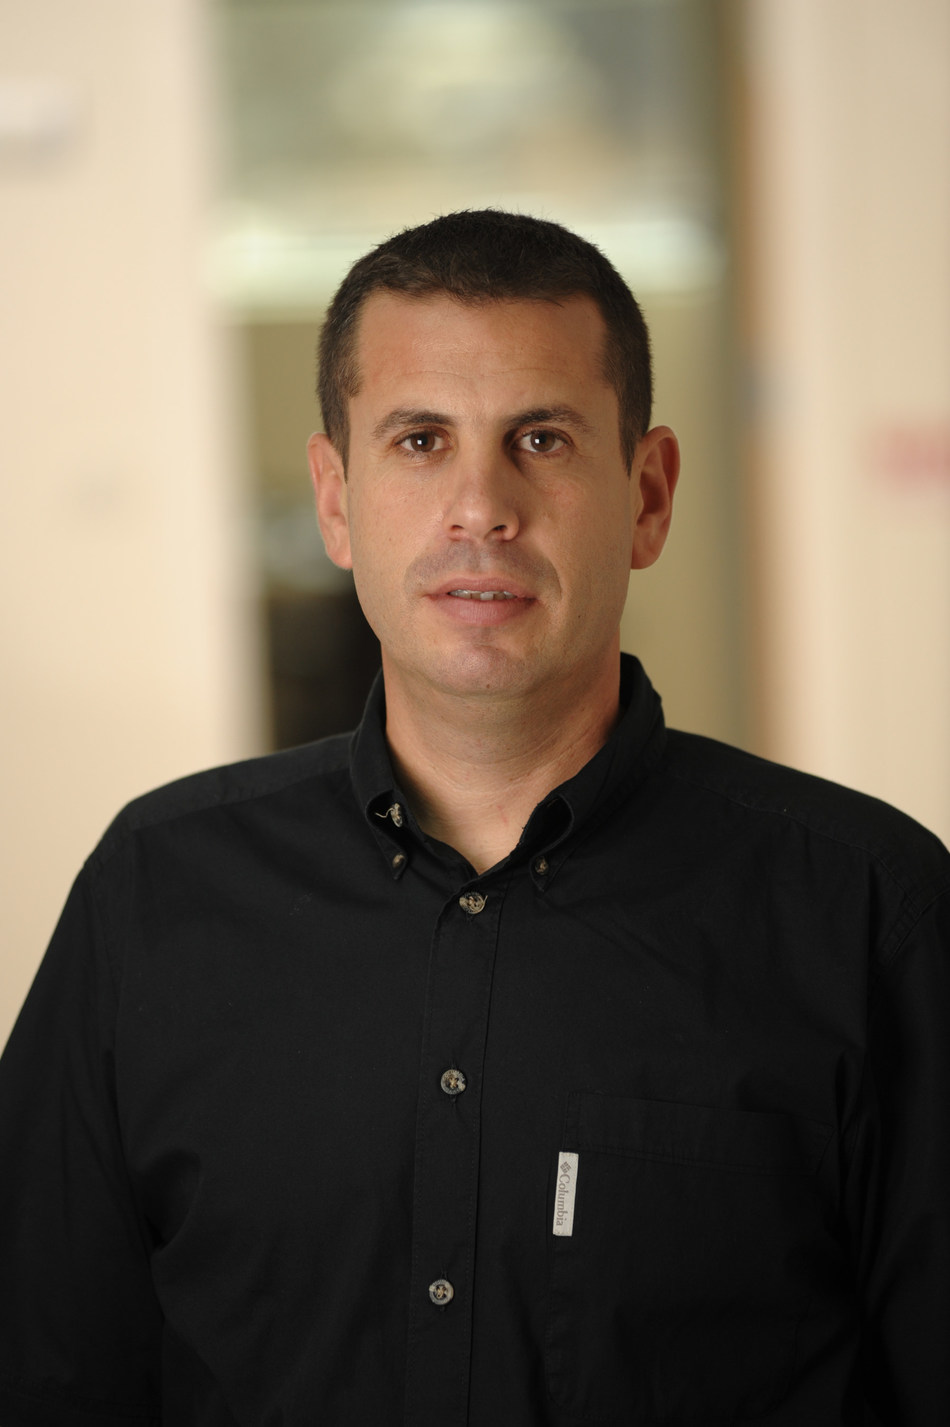 Samuel Wasserman, CEO and Co-founder, LiveU